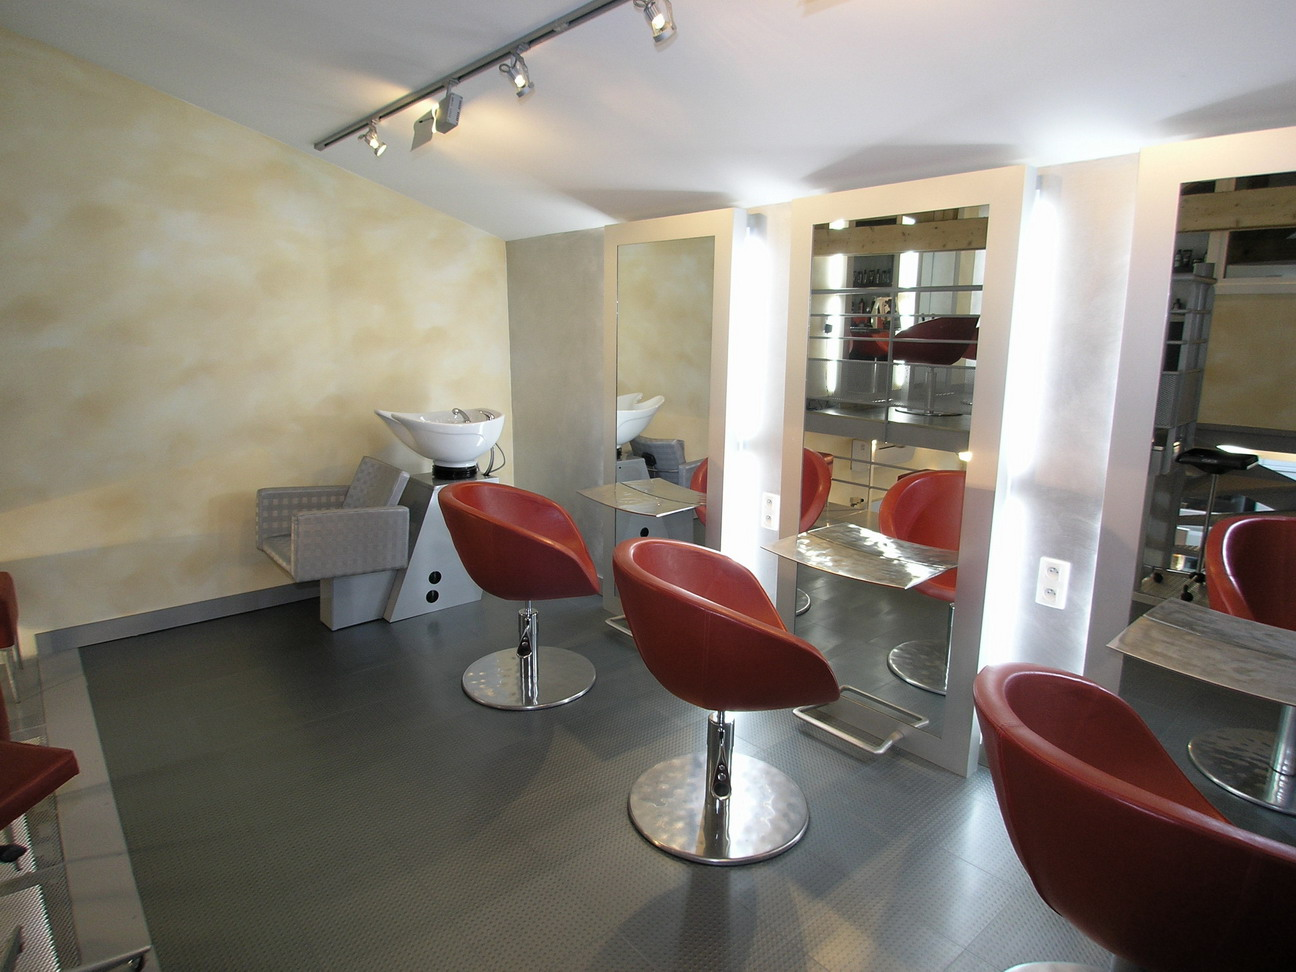 le blog du salon de coiffure. Black Bedroom Furniture Sets. Home Design Ideas